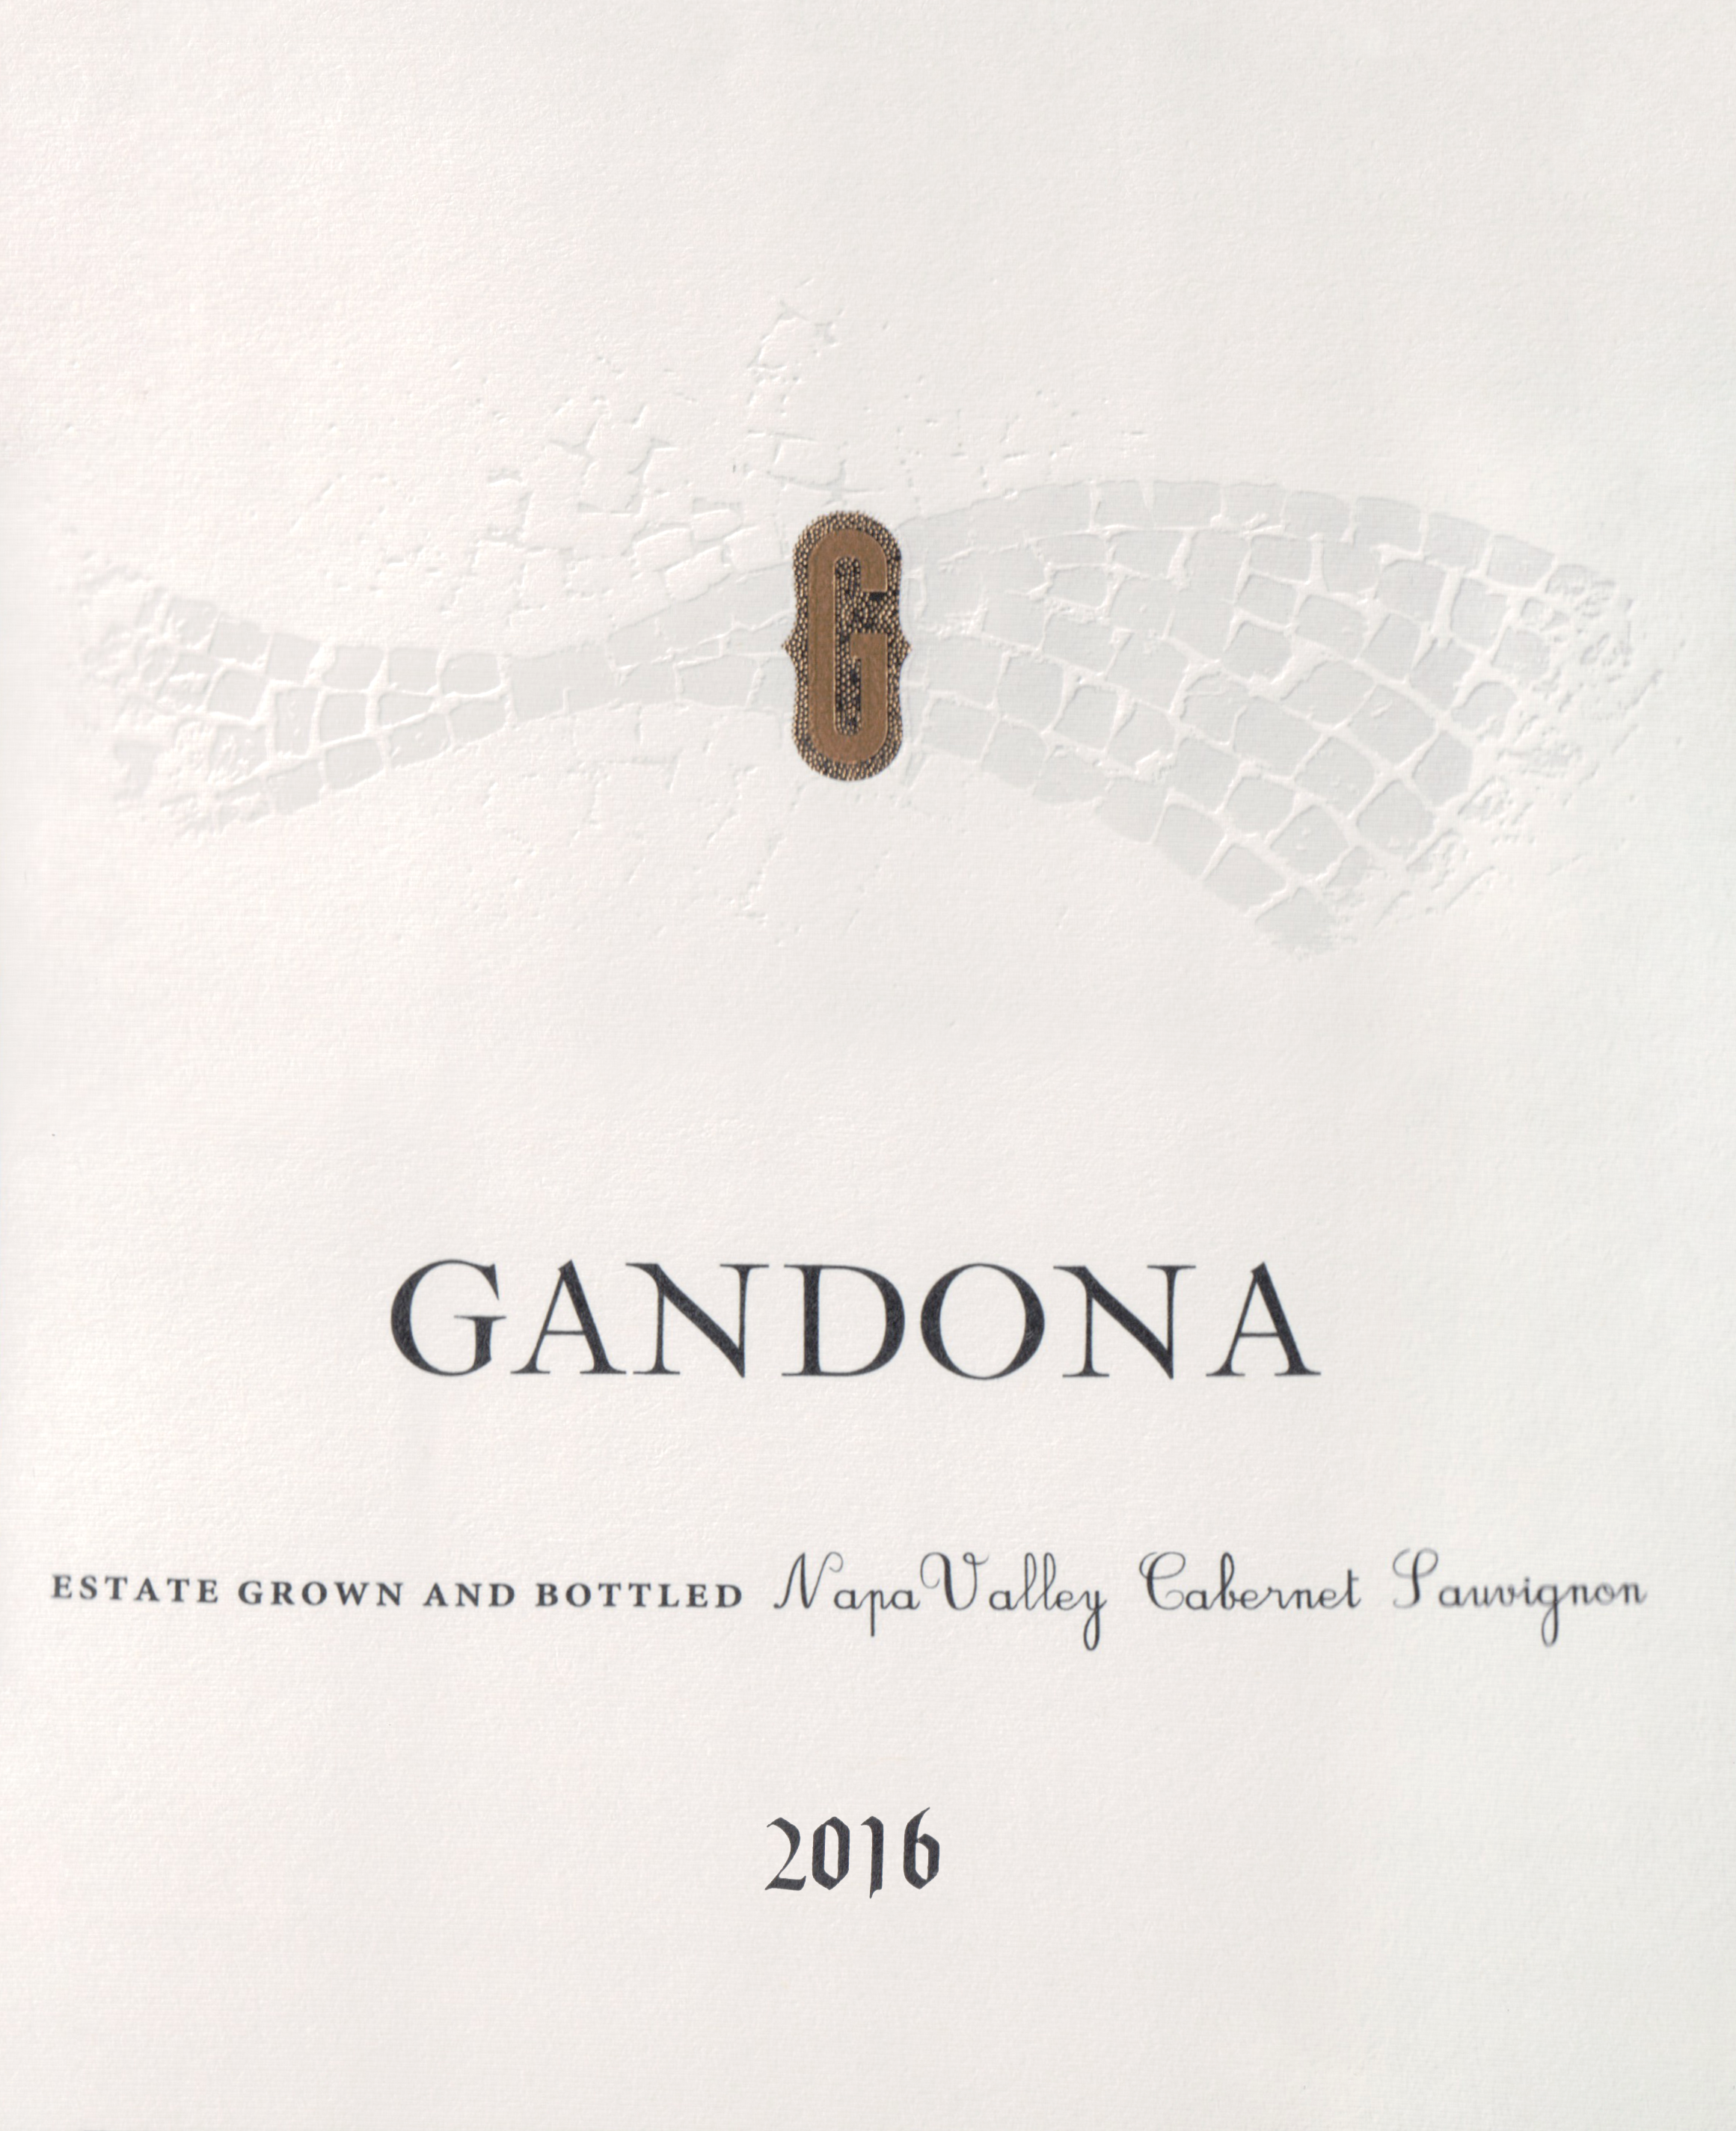 Gandona Estate Cabernet Sauvignon 2016